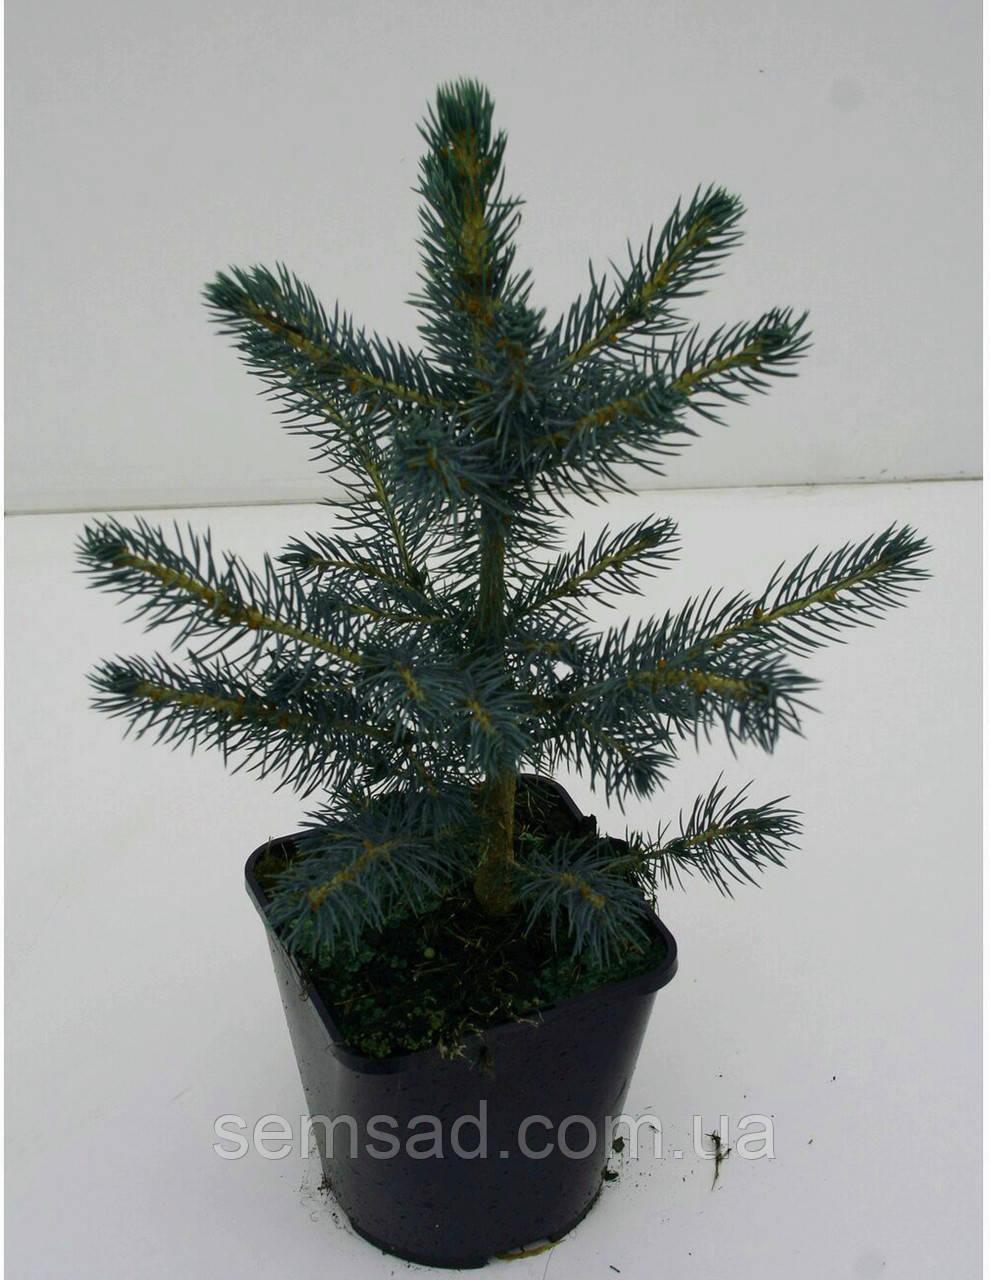 Ель колючая голубая Кейбаб \ Picea Pungens Glauca Kaibab ( С1.5) саженцы